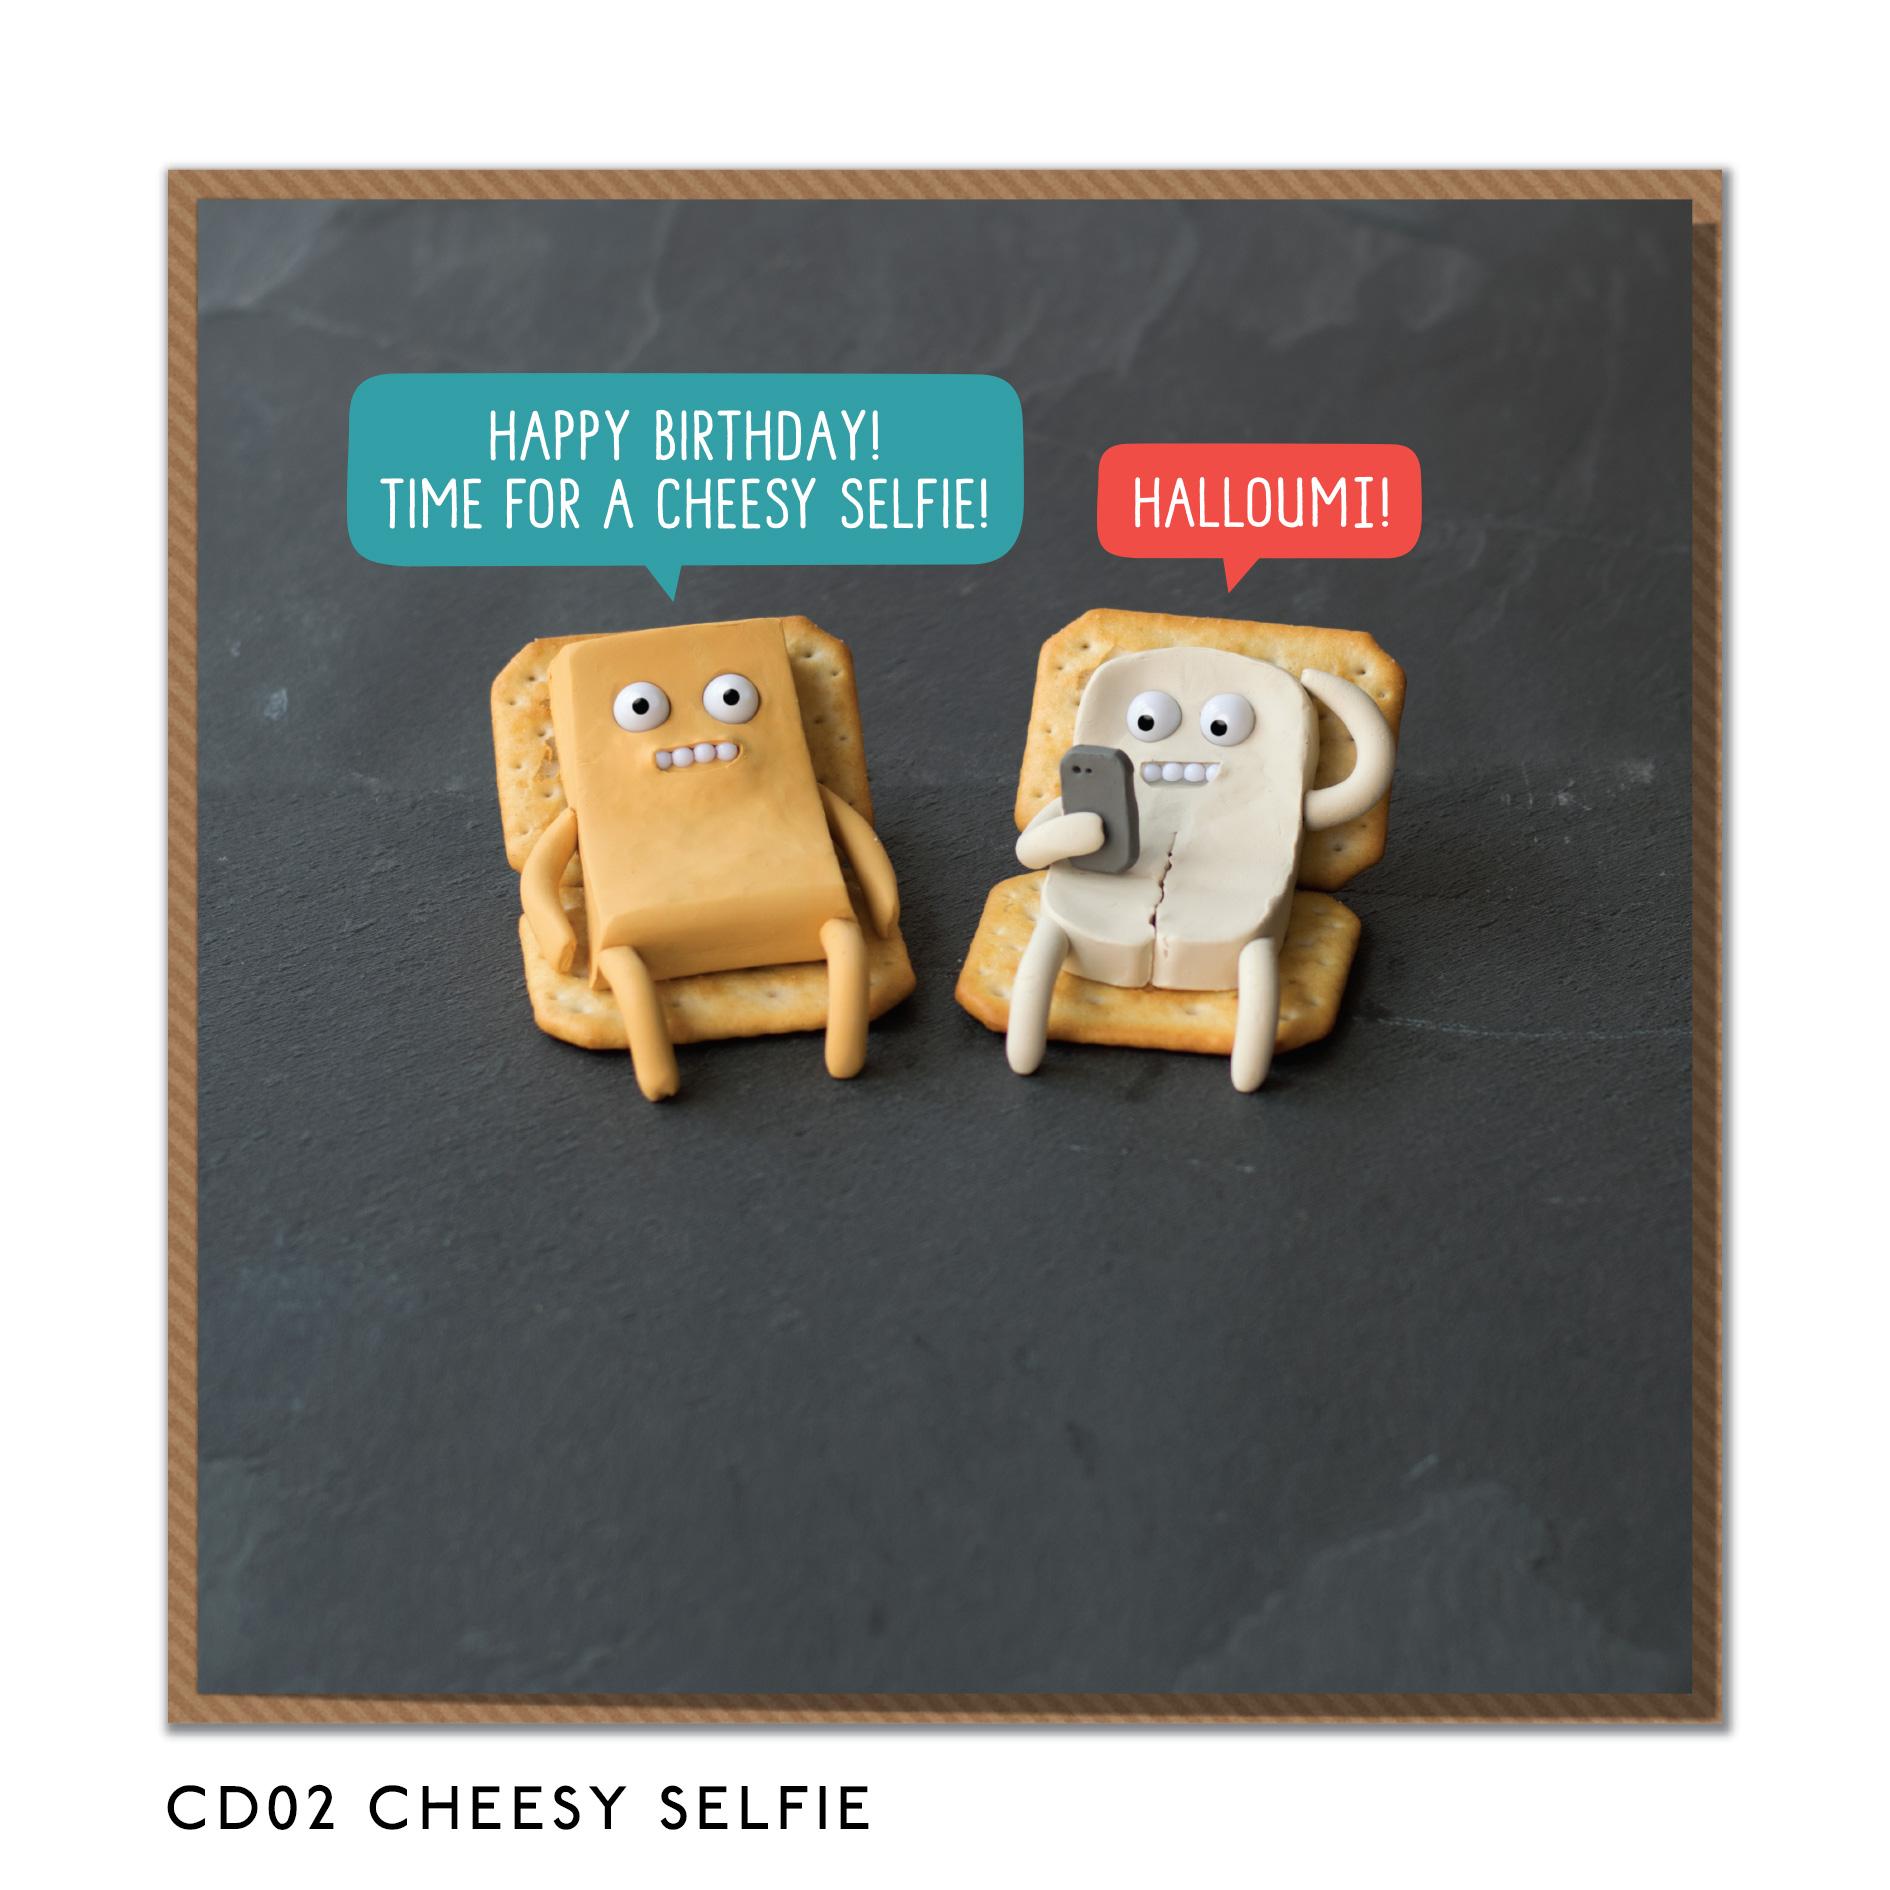 CD02-CHEESY-SELFIE.jpg